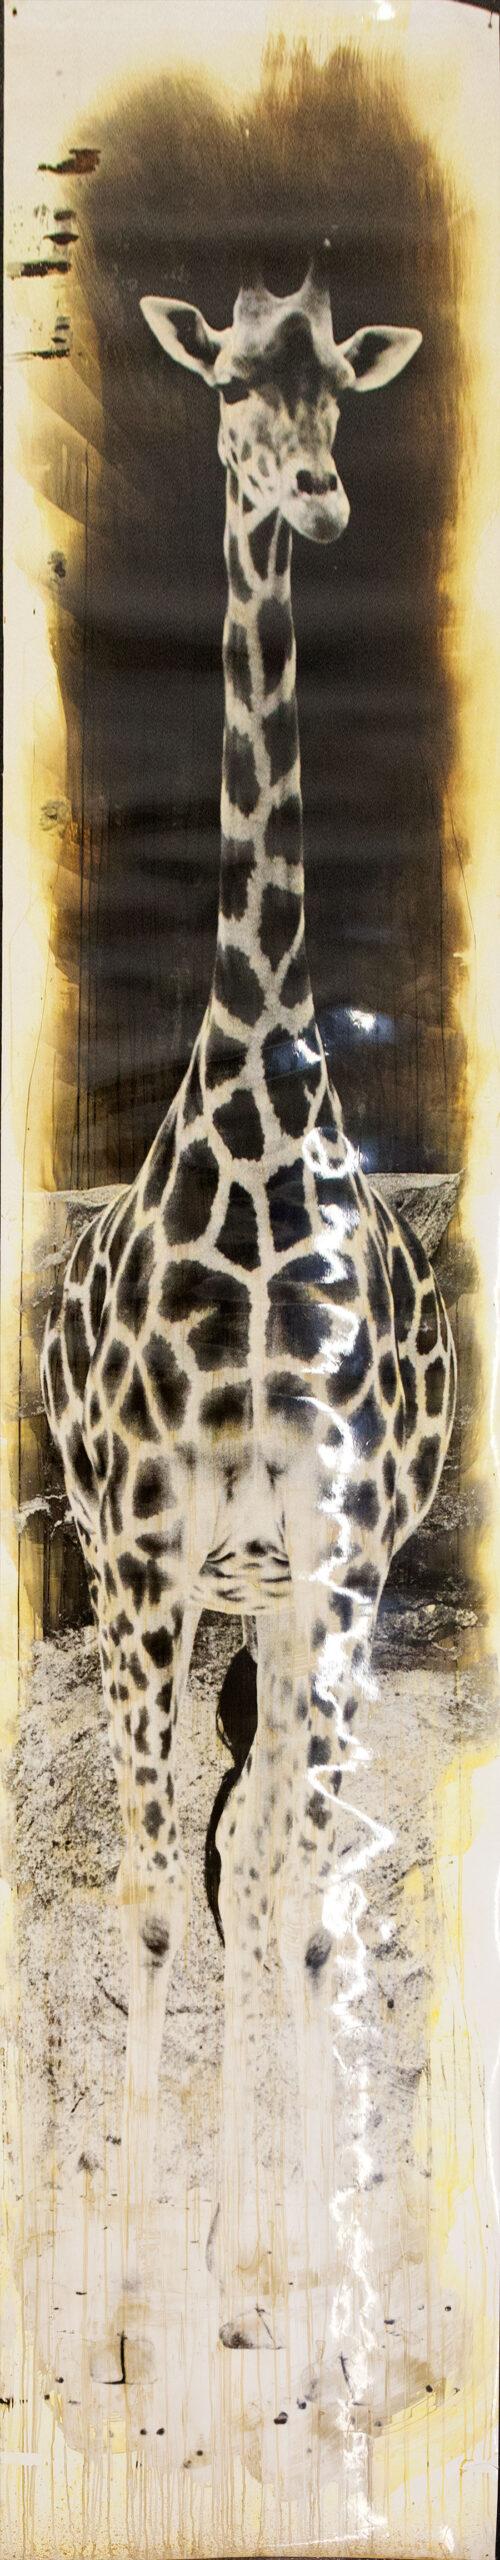 Giraffe.2.b